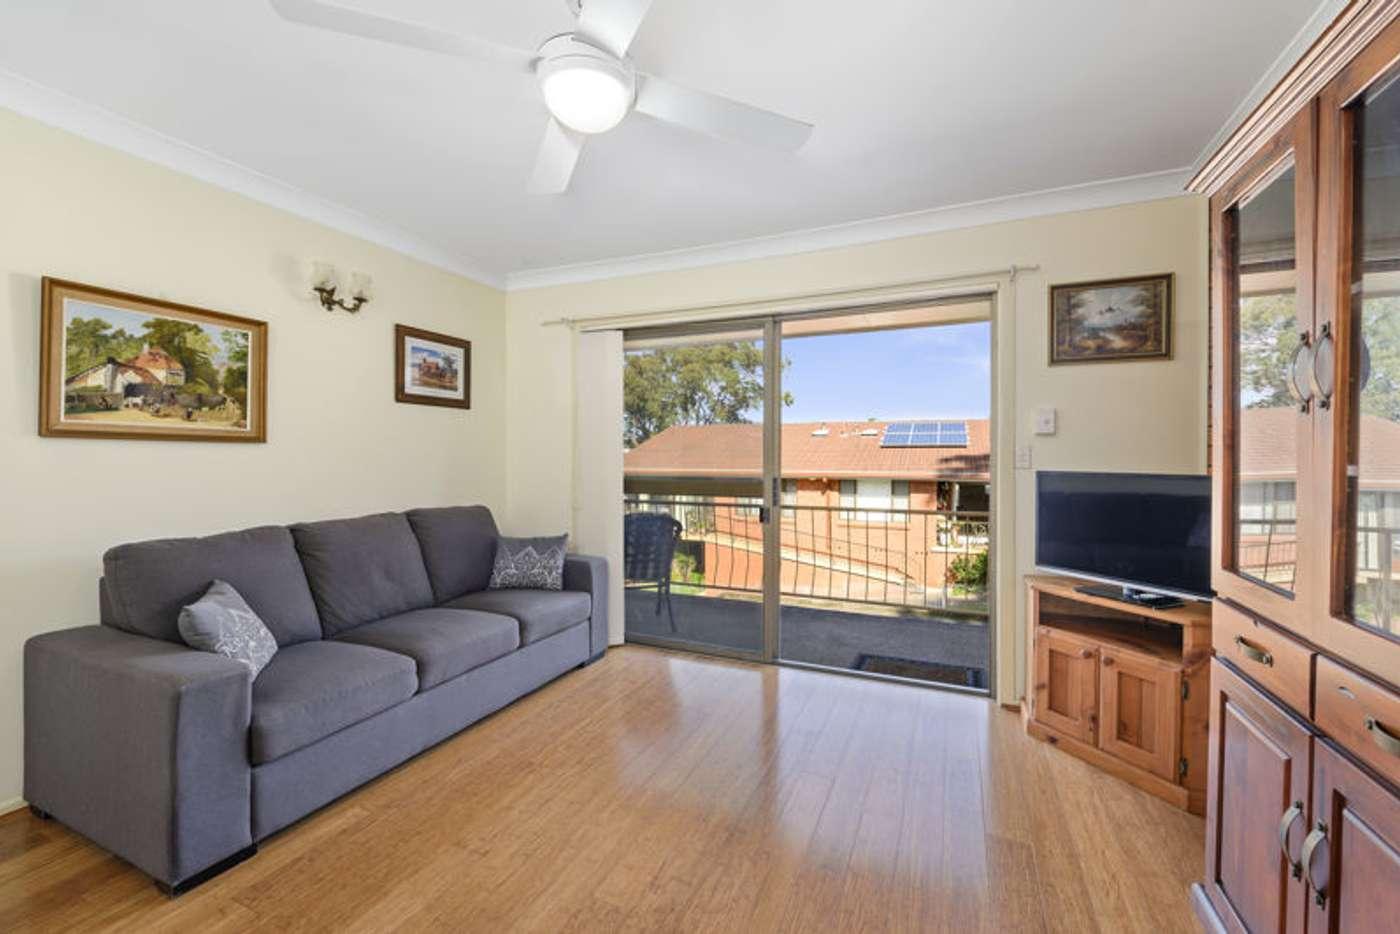 Sixth view of Homely unit listing, 3/4204 Giinagay Way, Urunga NSW 2455